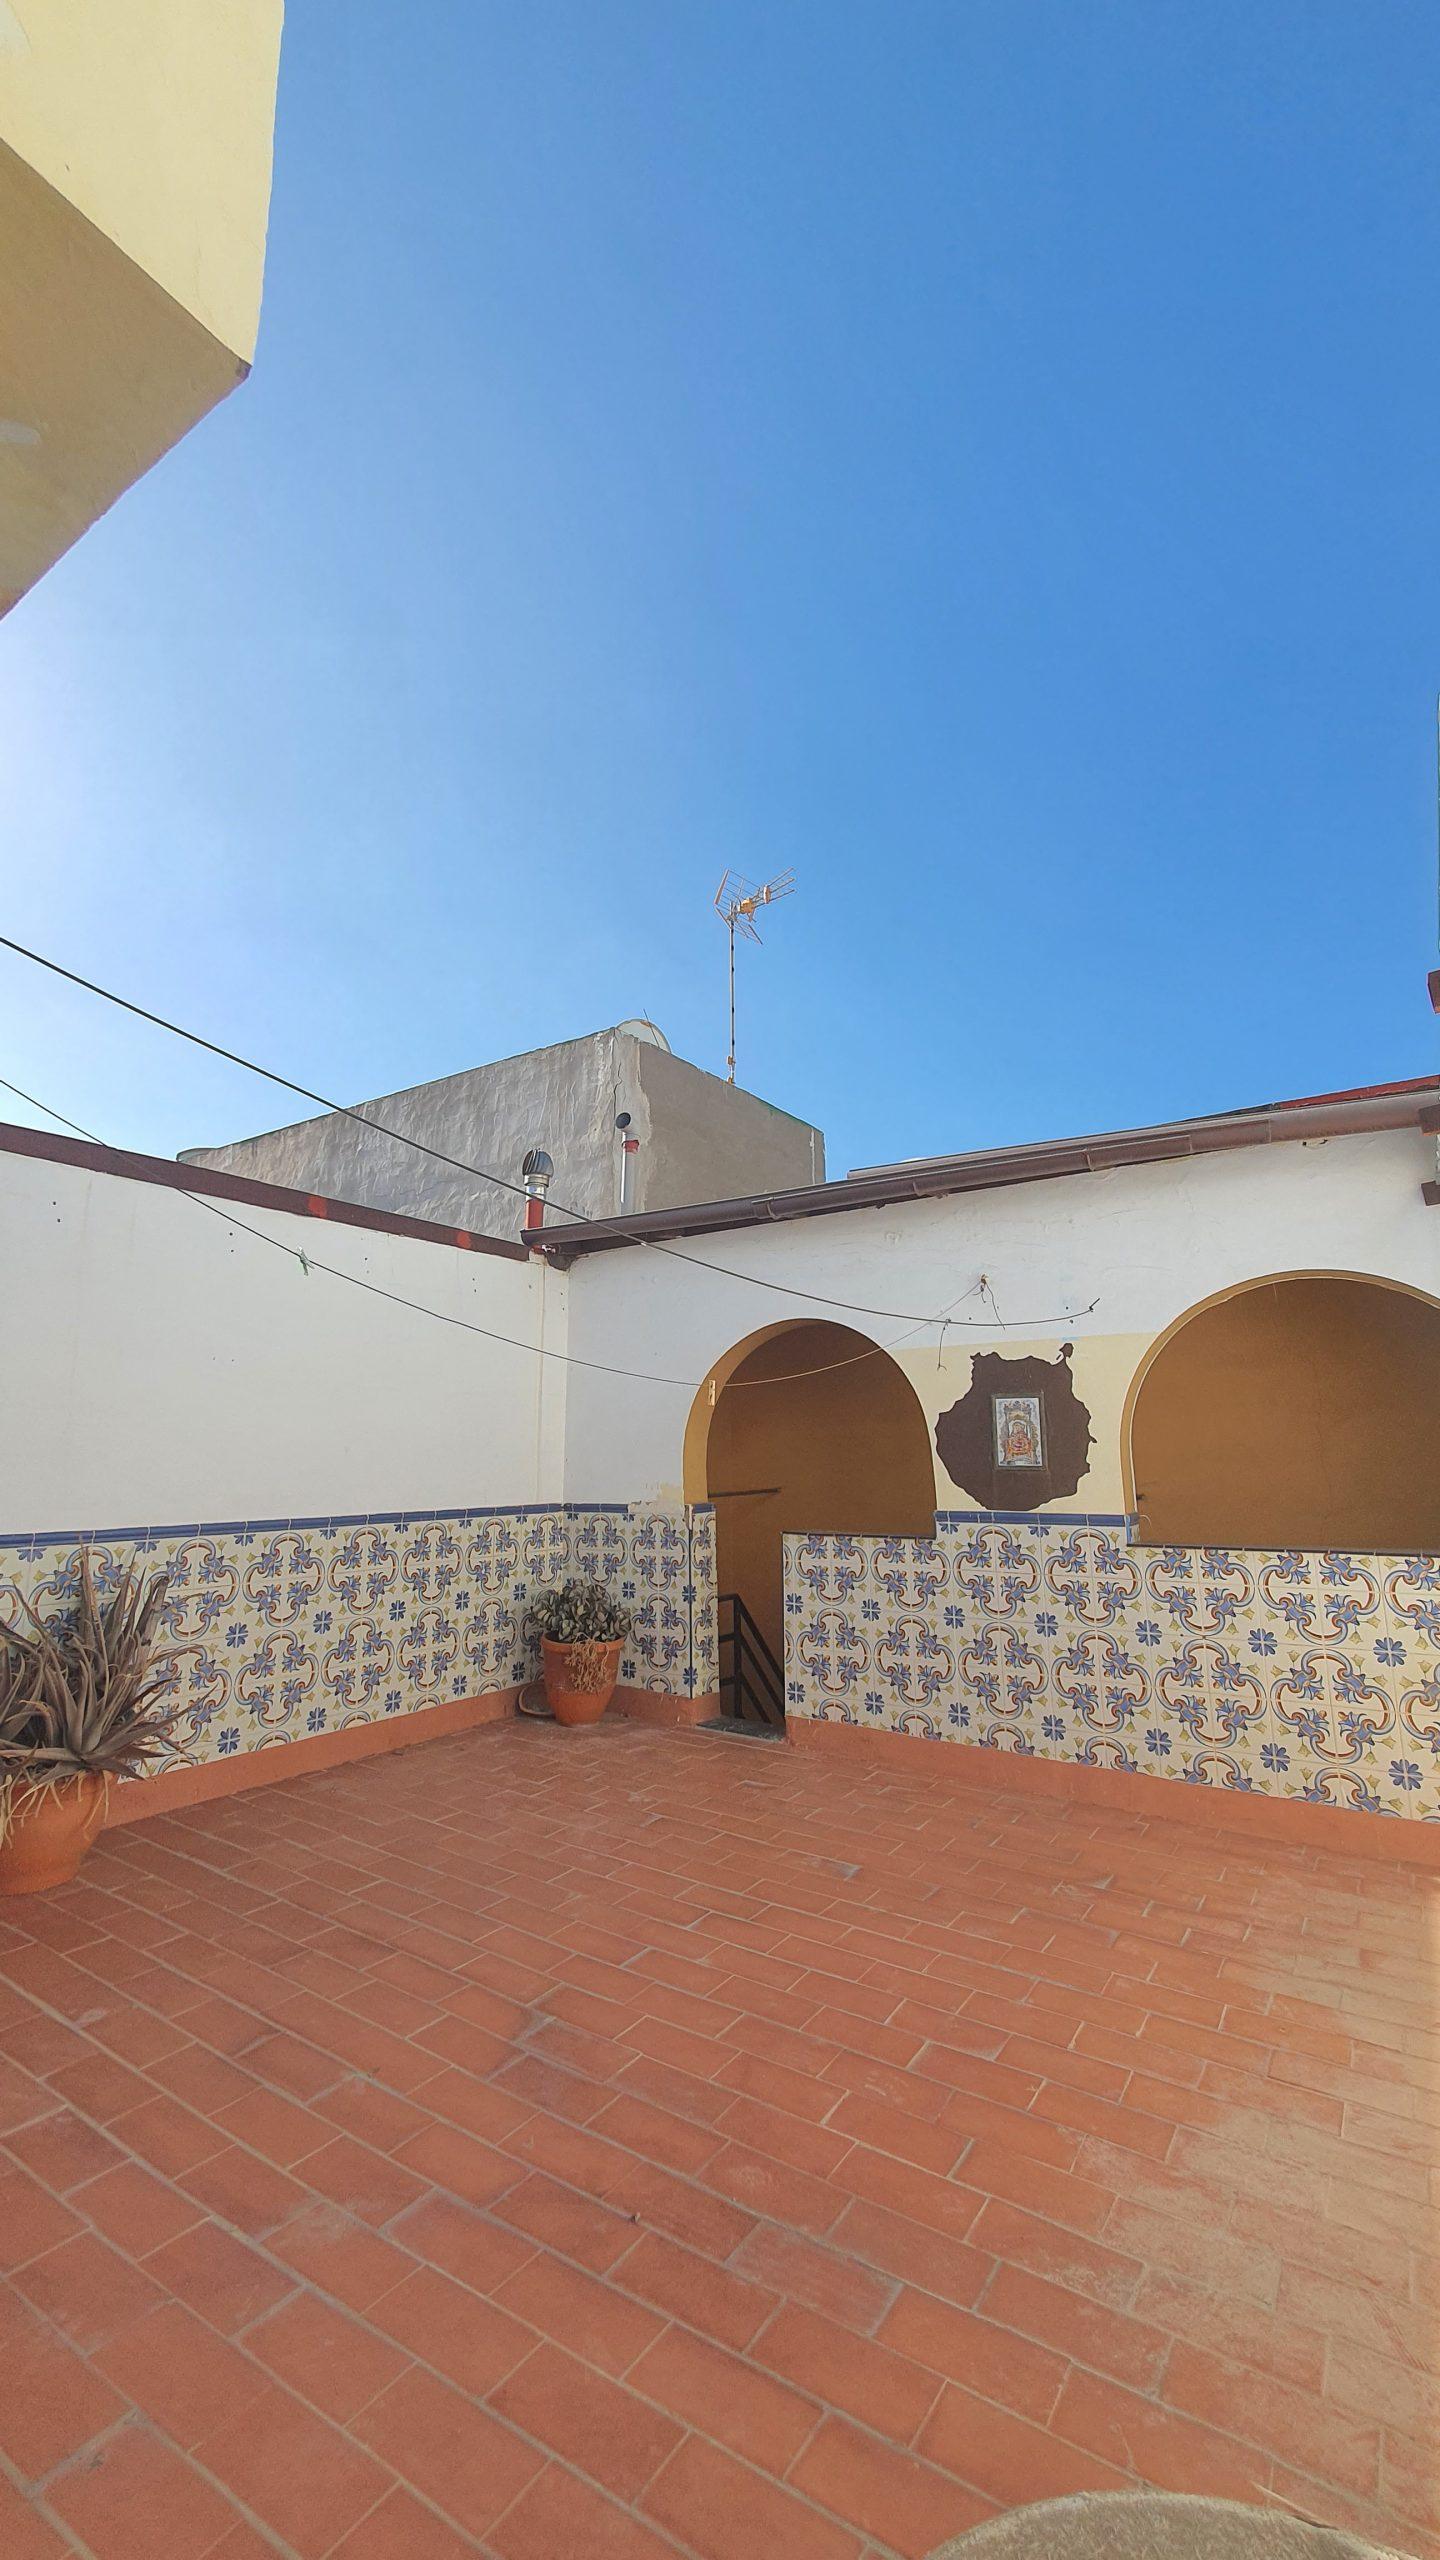 Casa / Chalet adosado en venta en calle Américo Vespucio, 2, Santa Lucía de Tirajana